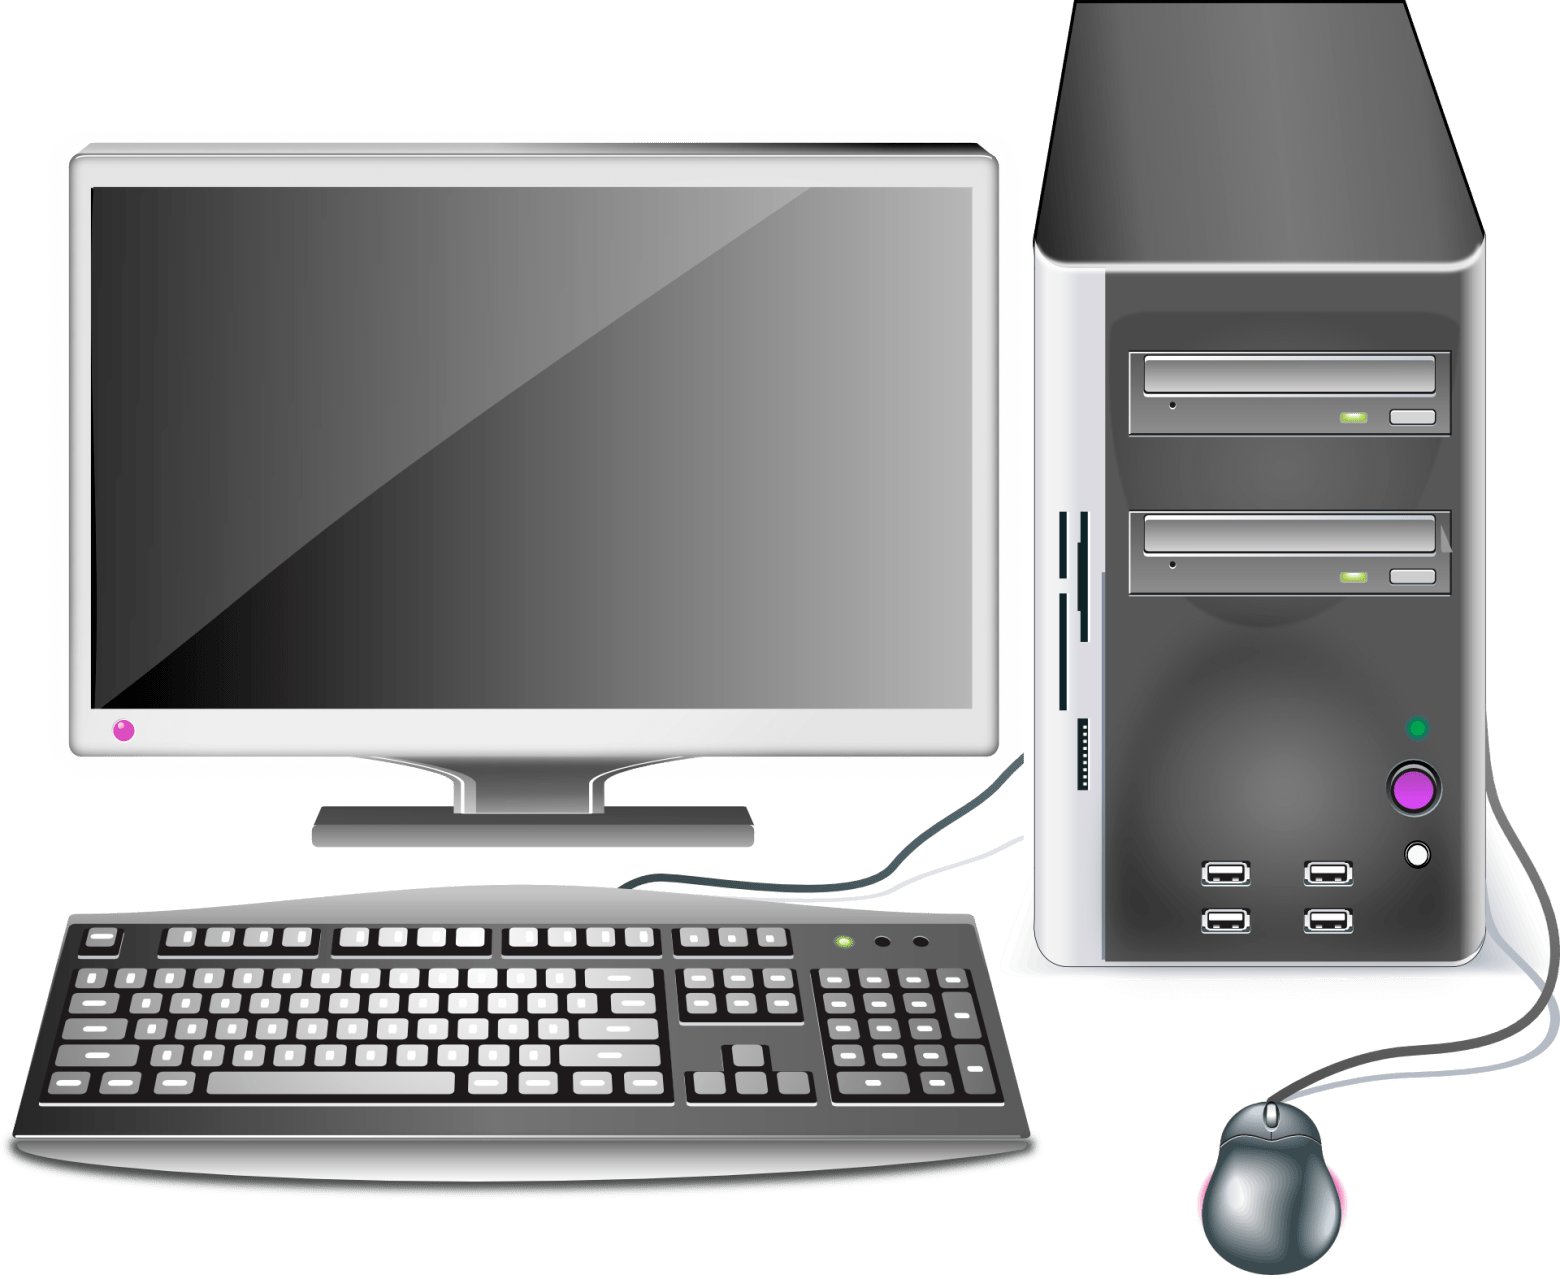 Clipart ordinateur 2 » Clipart Portal.